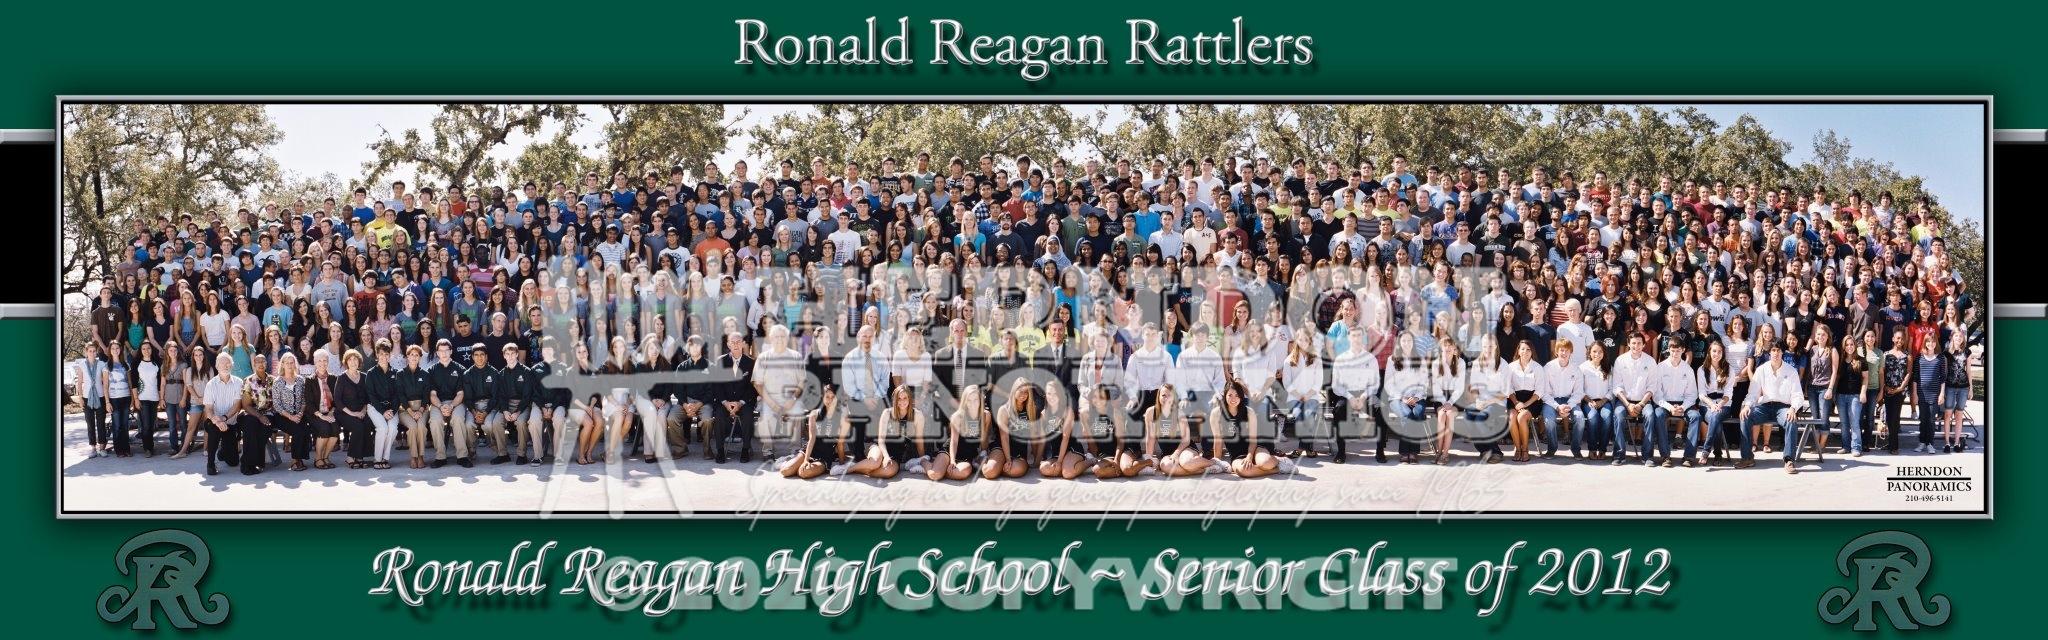 Ronald-Reagan-Stevens-High-School-Senior-Class-of-2012